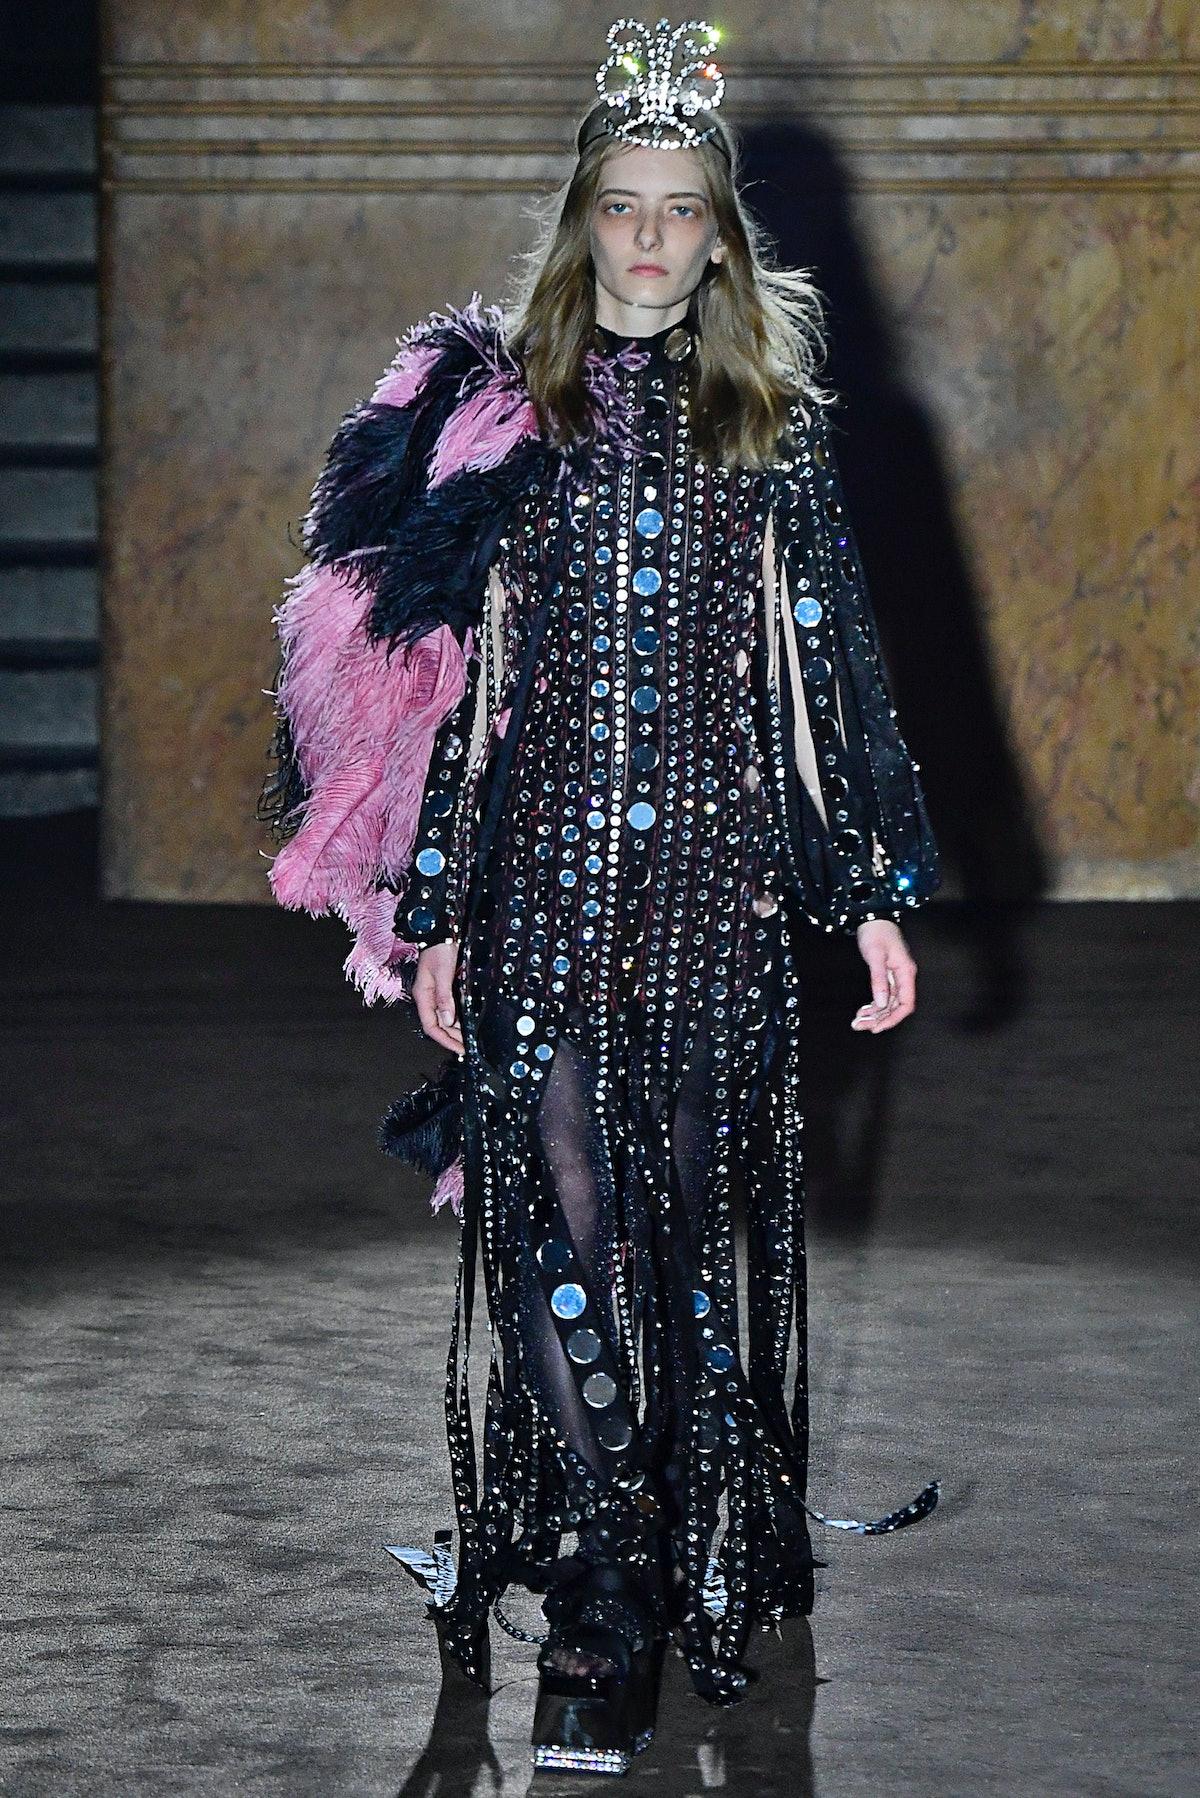 Gucci - Runway - Paris Fashion Week Spring/Summer 2019